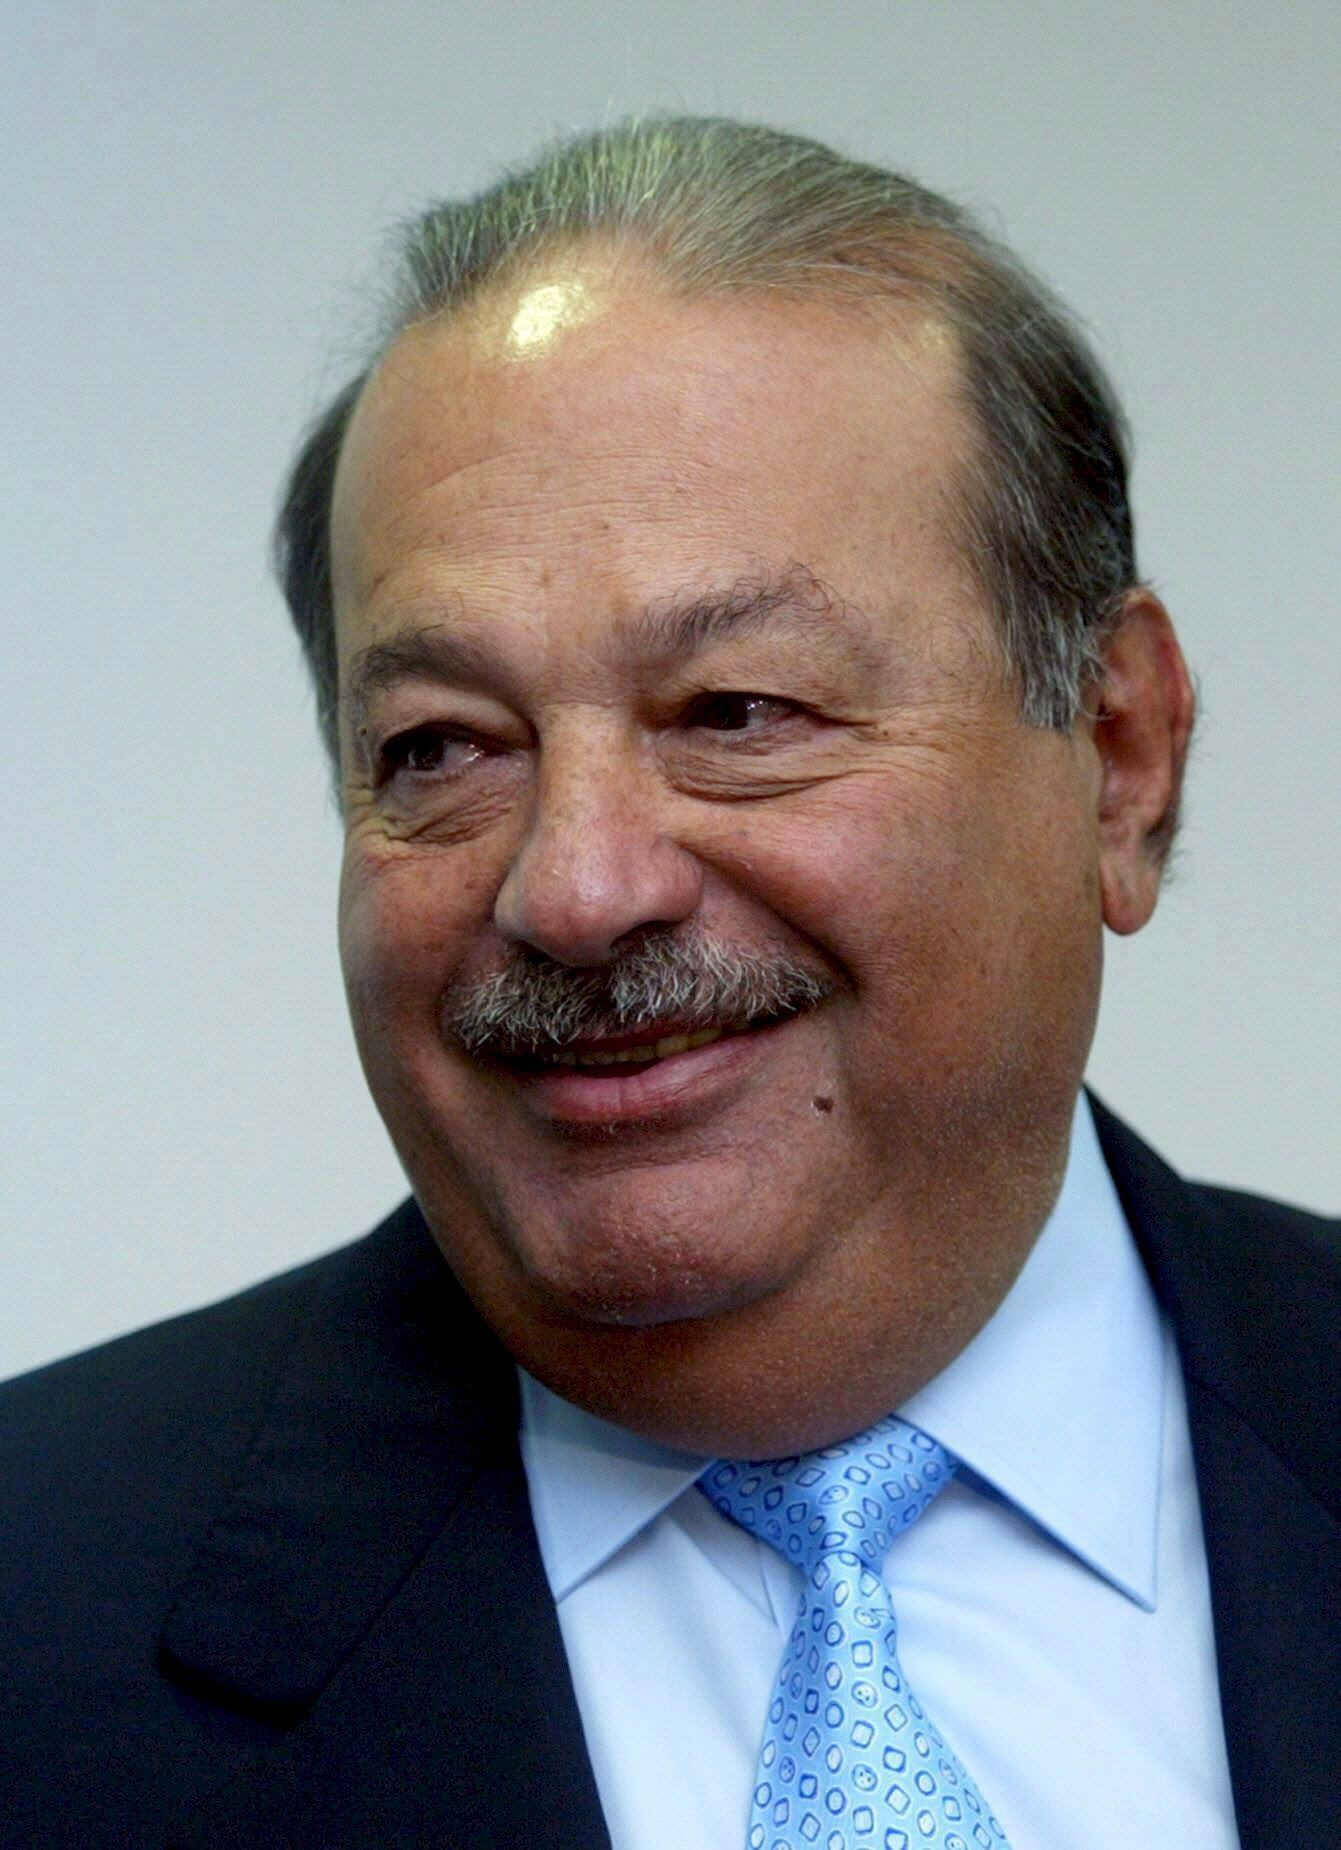 NUR FÜR SPAM Carlos Slim